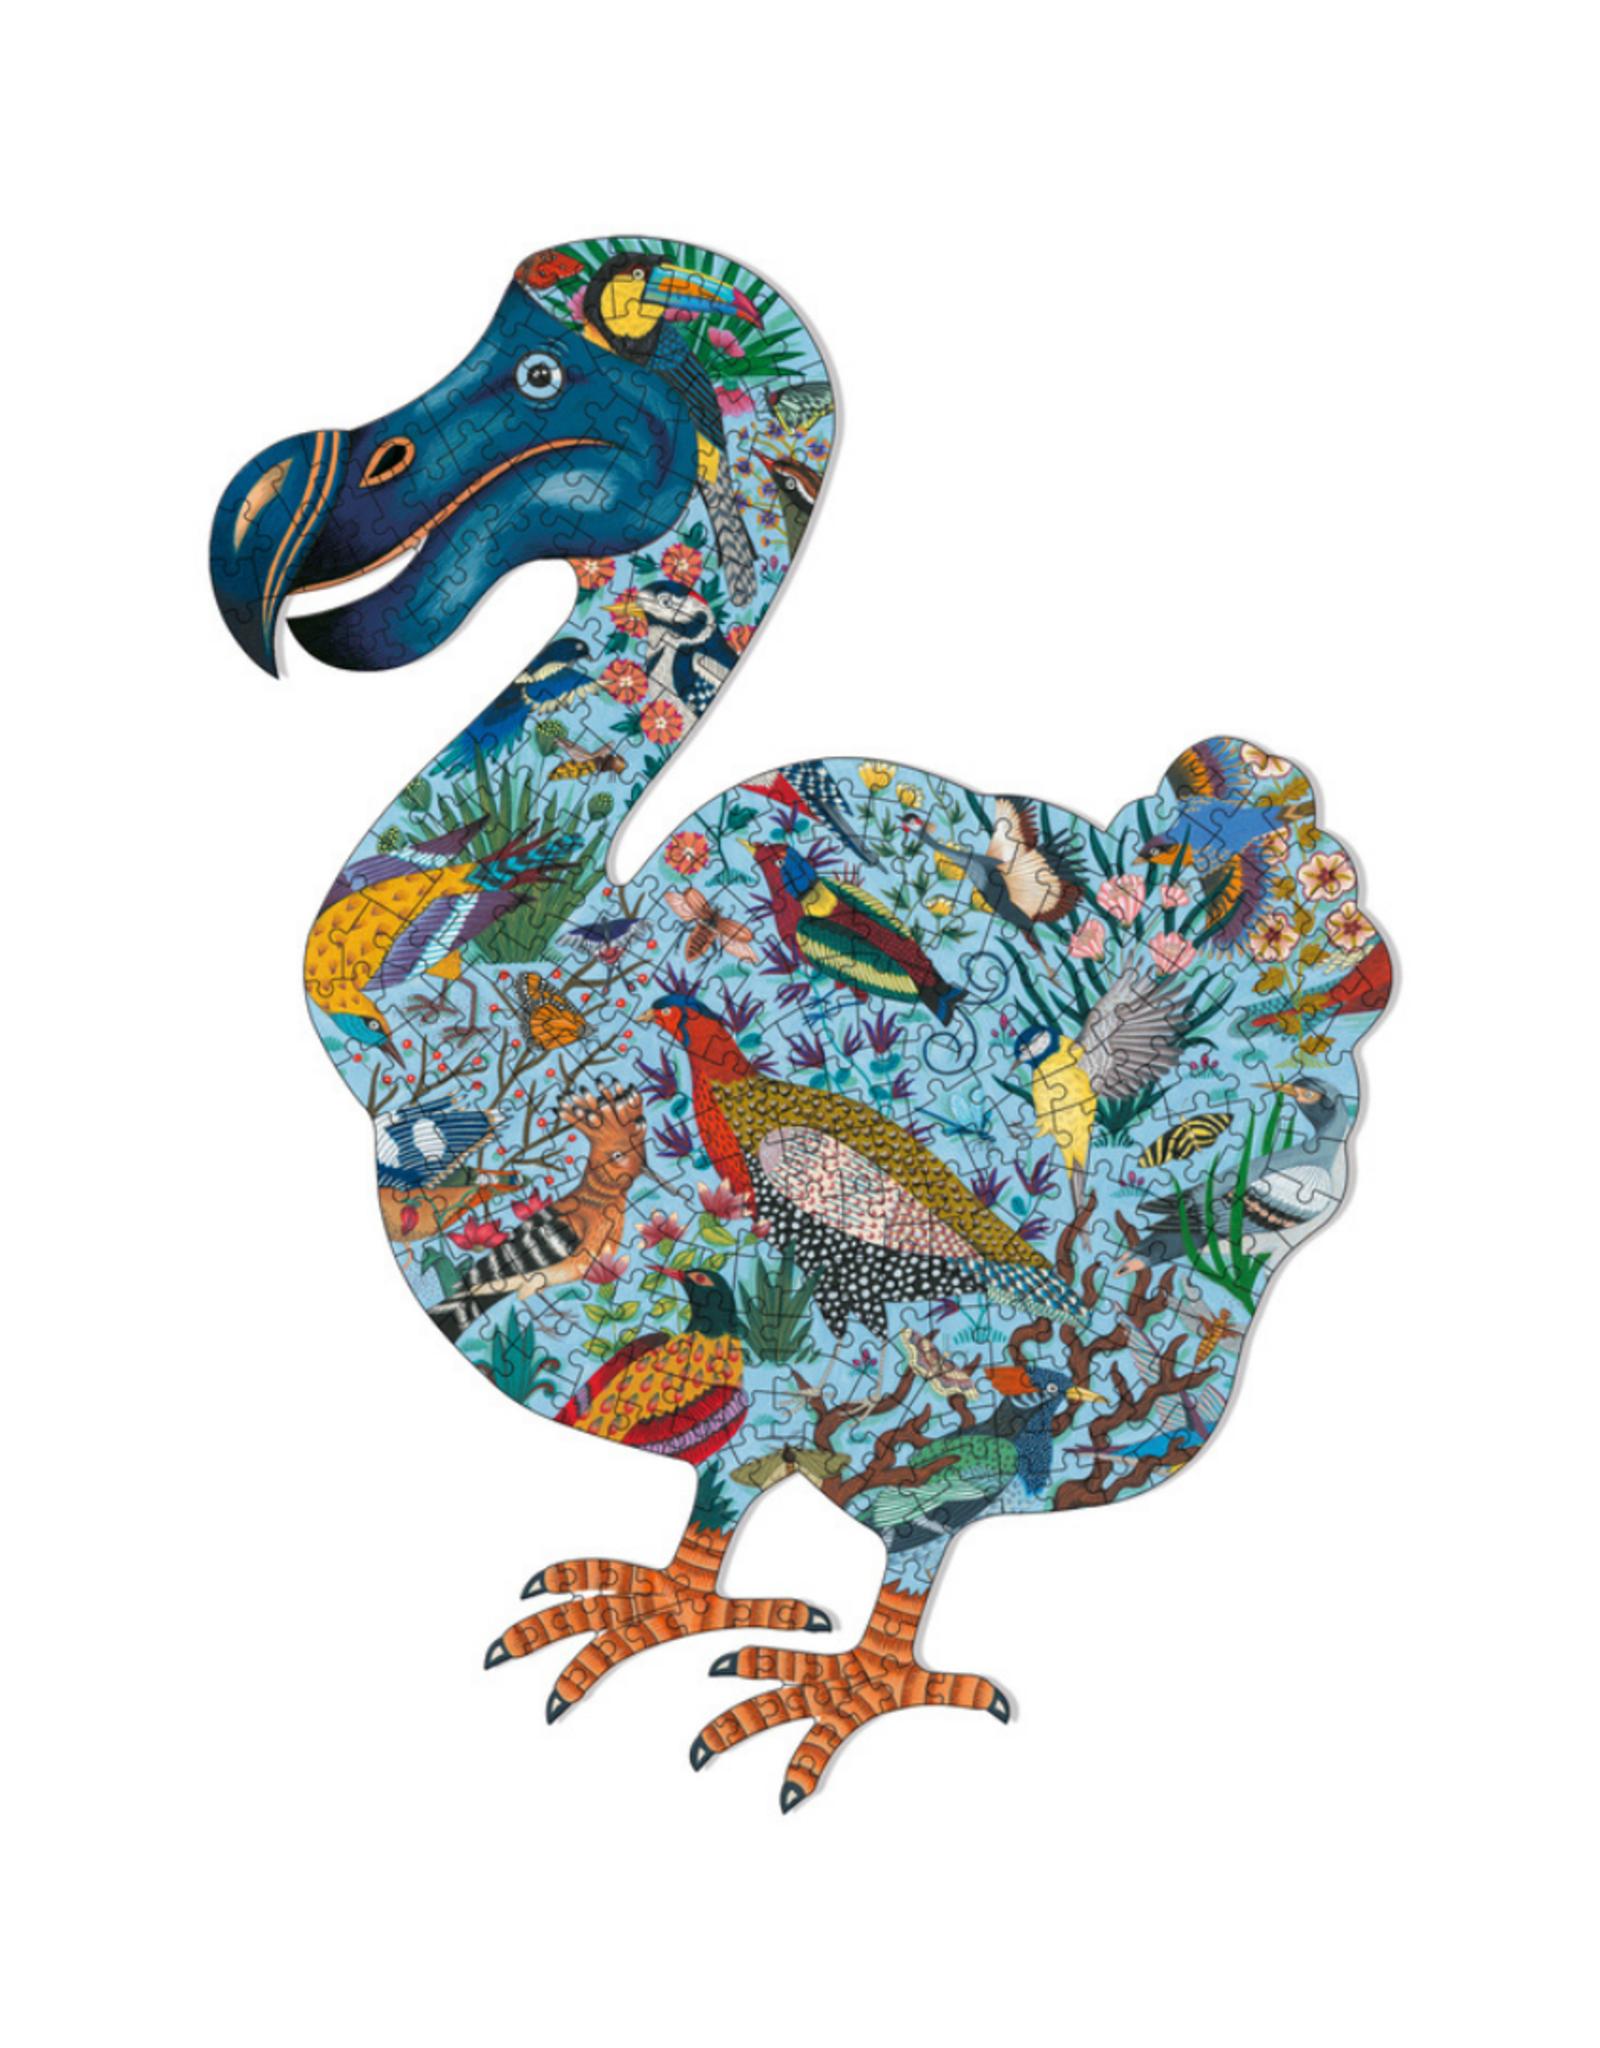 Djeco Puzz'Art Dodo Shaped Jigsaw Puzzle 350pc